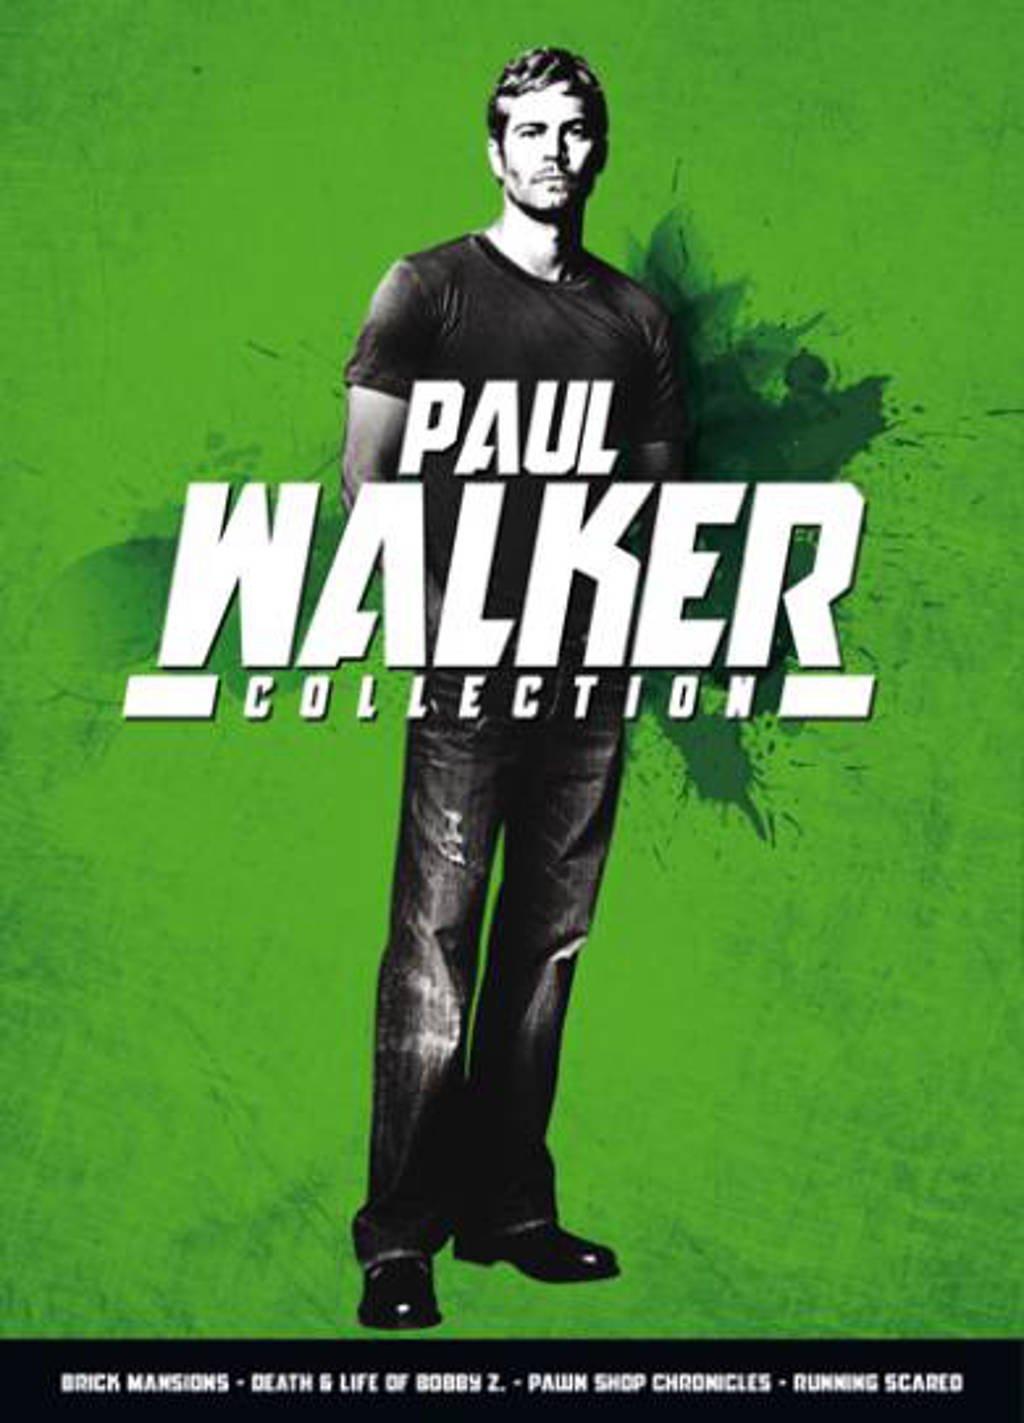 Paul Walker collection (DVD)